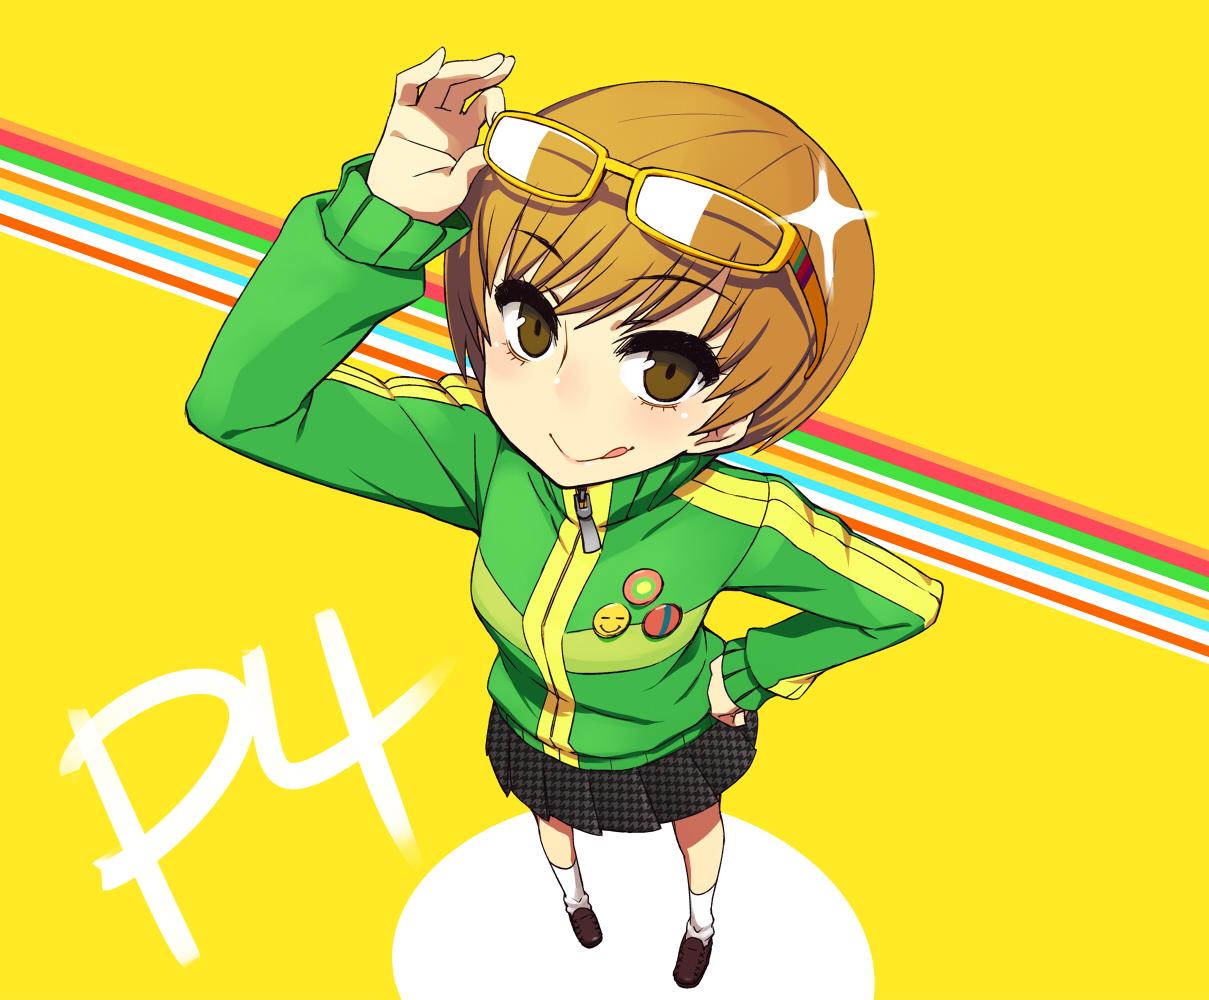 Satonaka Chie Image #803323 - Zerochan Anime Image Board